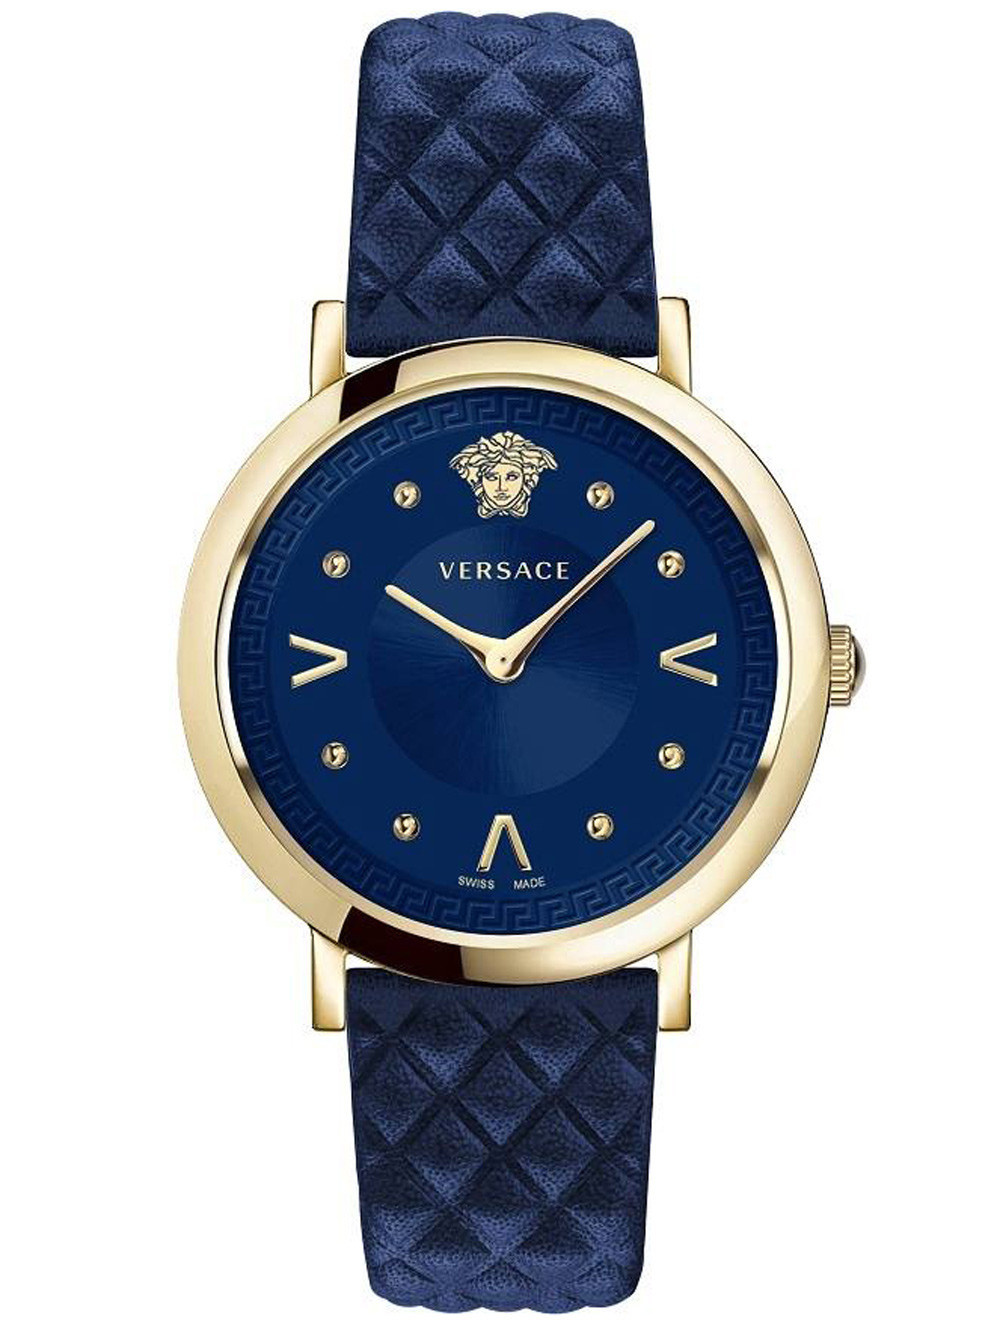 Versace VEVD00319 Pop Chic dames horloge